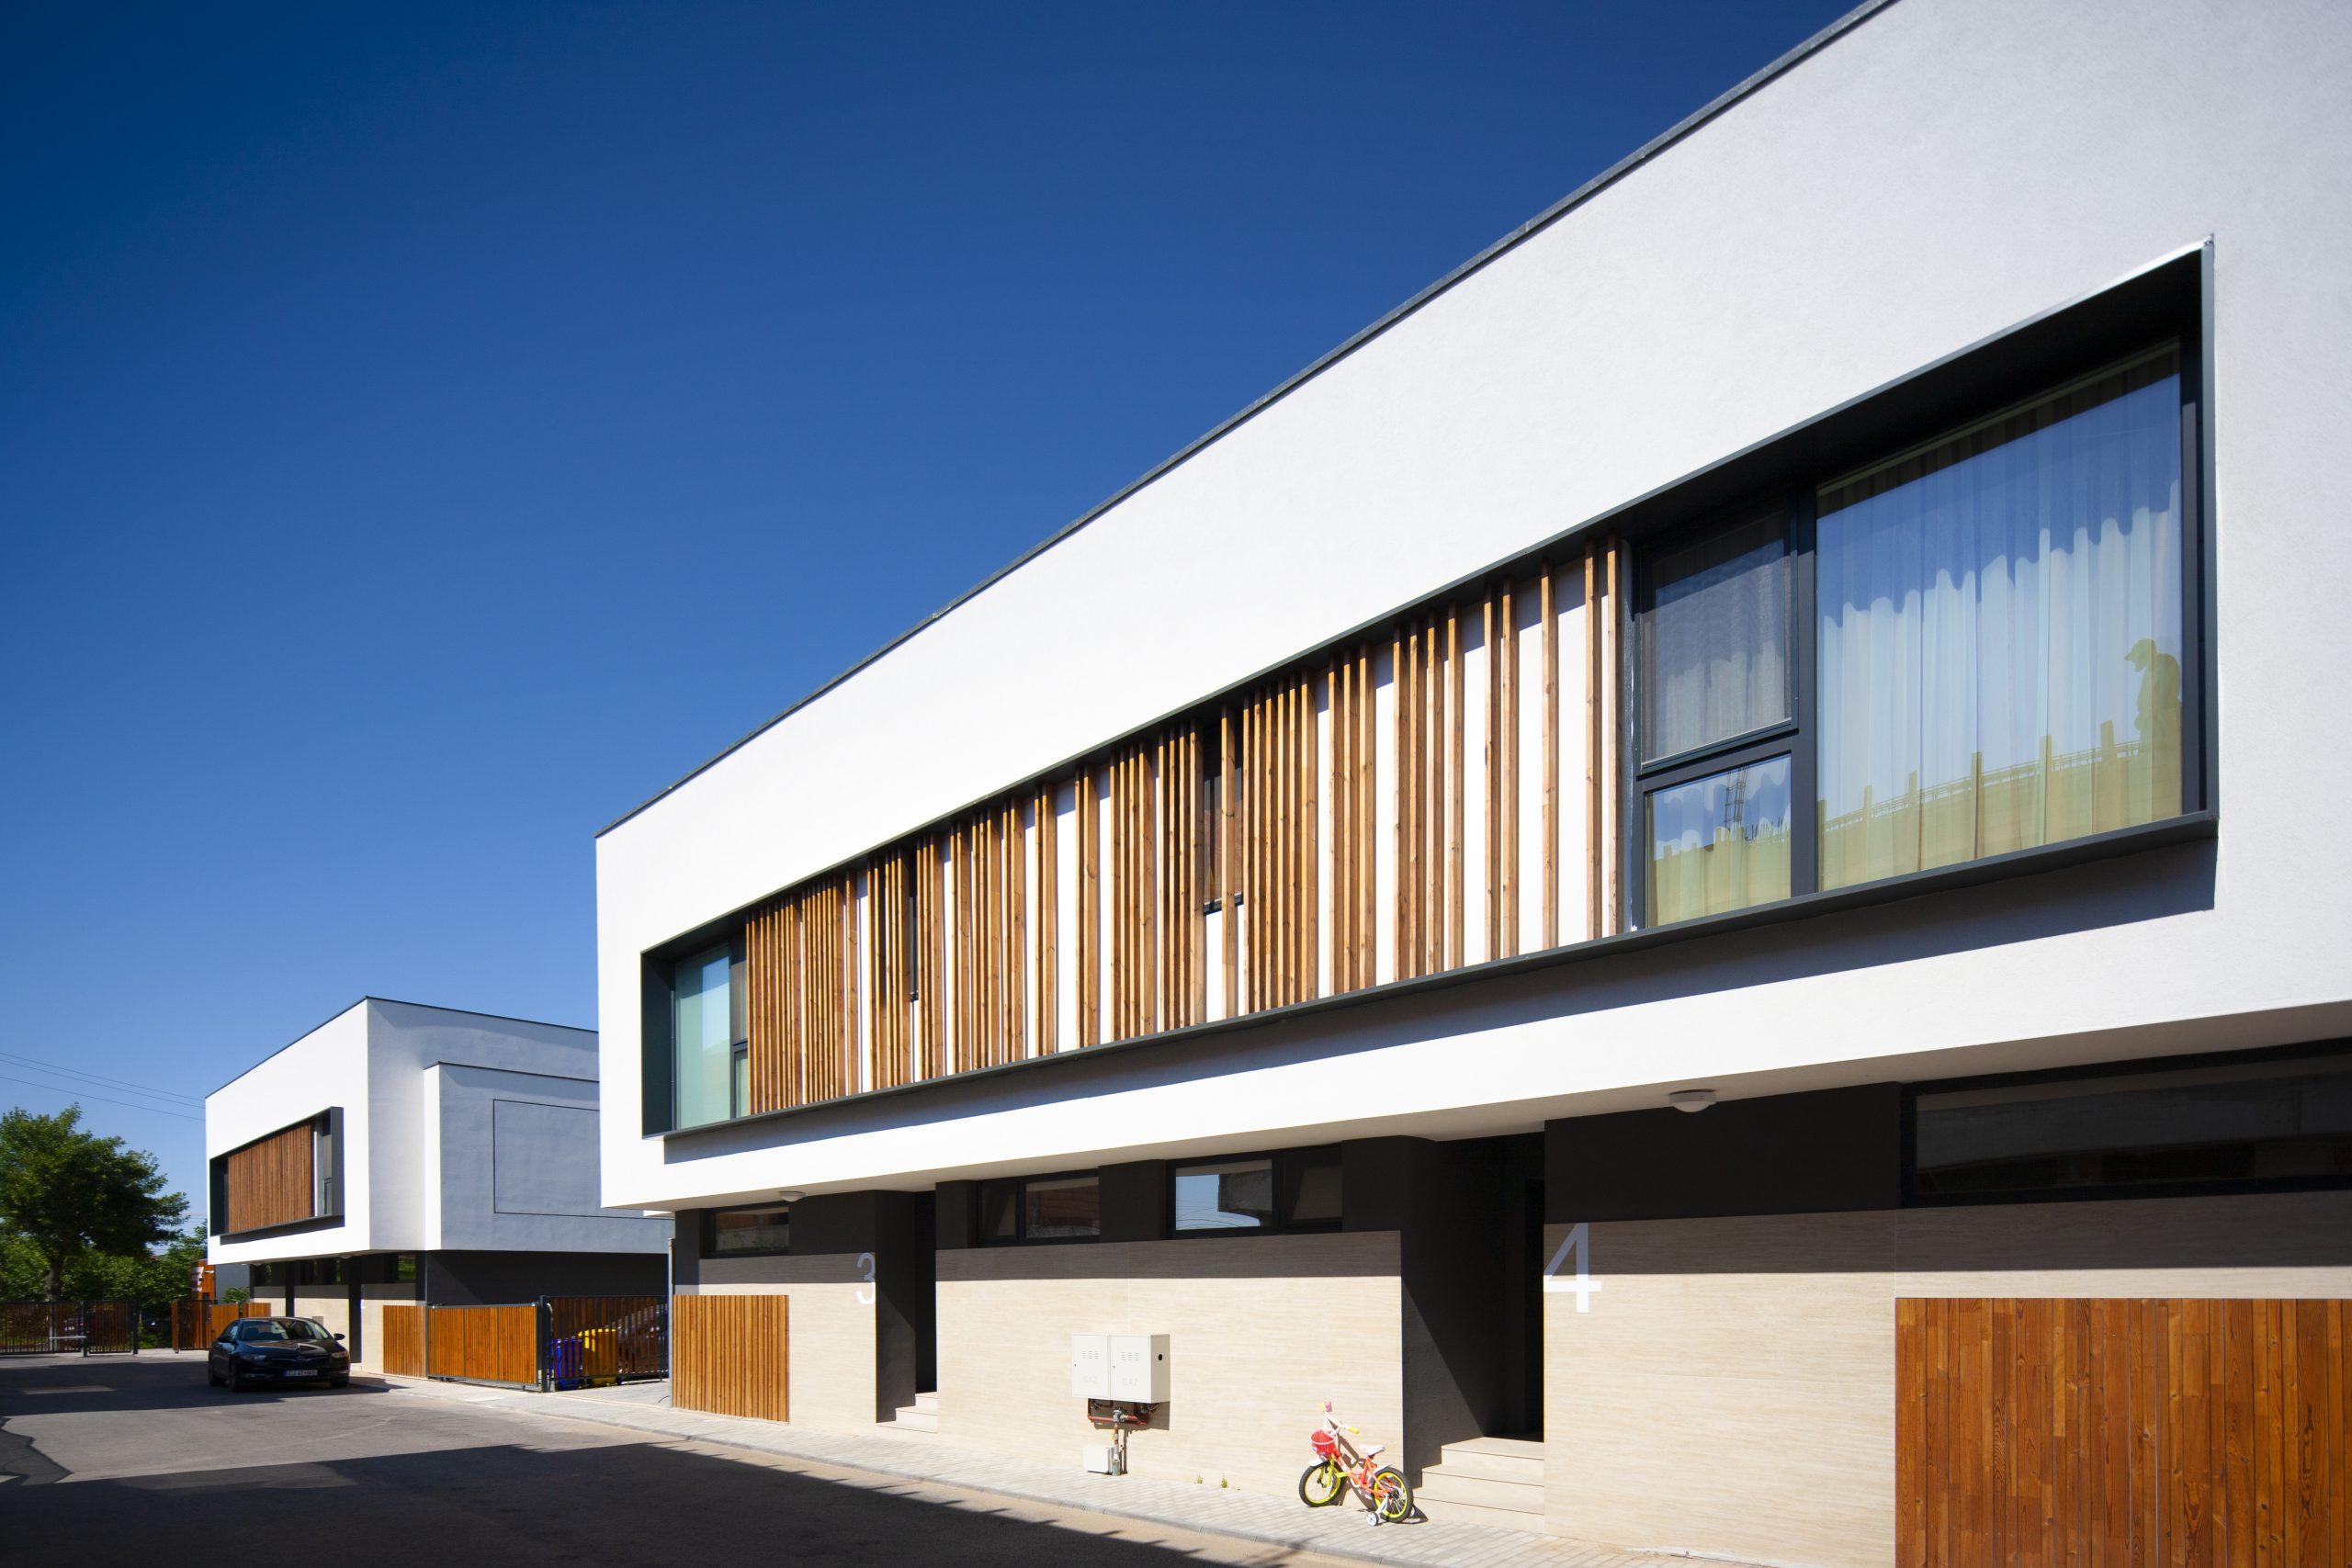 https://nbc-arhitect.ro/wp-content/uploads/2020/10/NBC-Arhitect-_-residentials-_-Contemporan-Residence-_-Bucharest-Romania_13-1-scaled.jpg